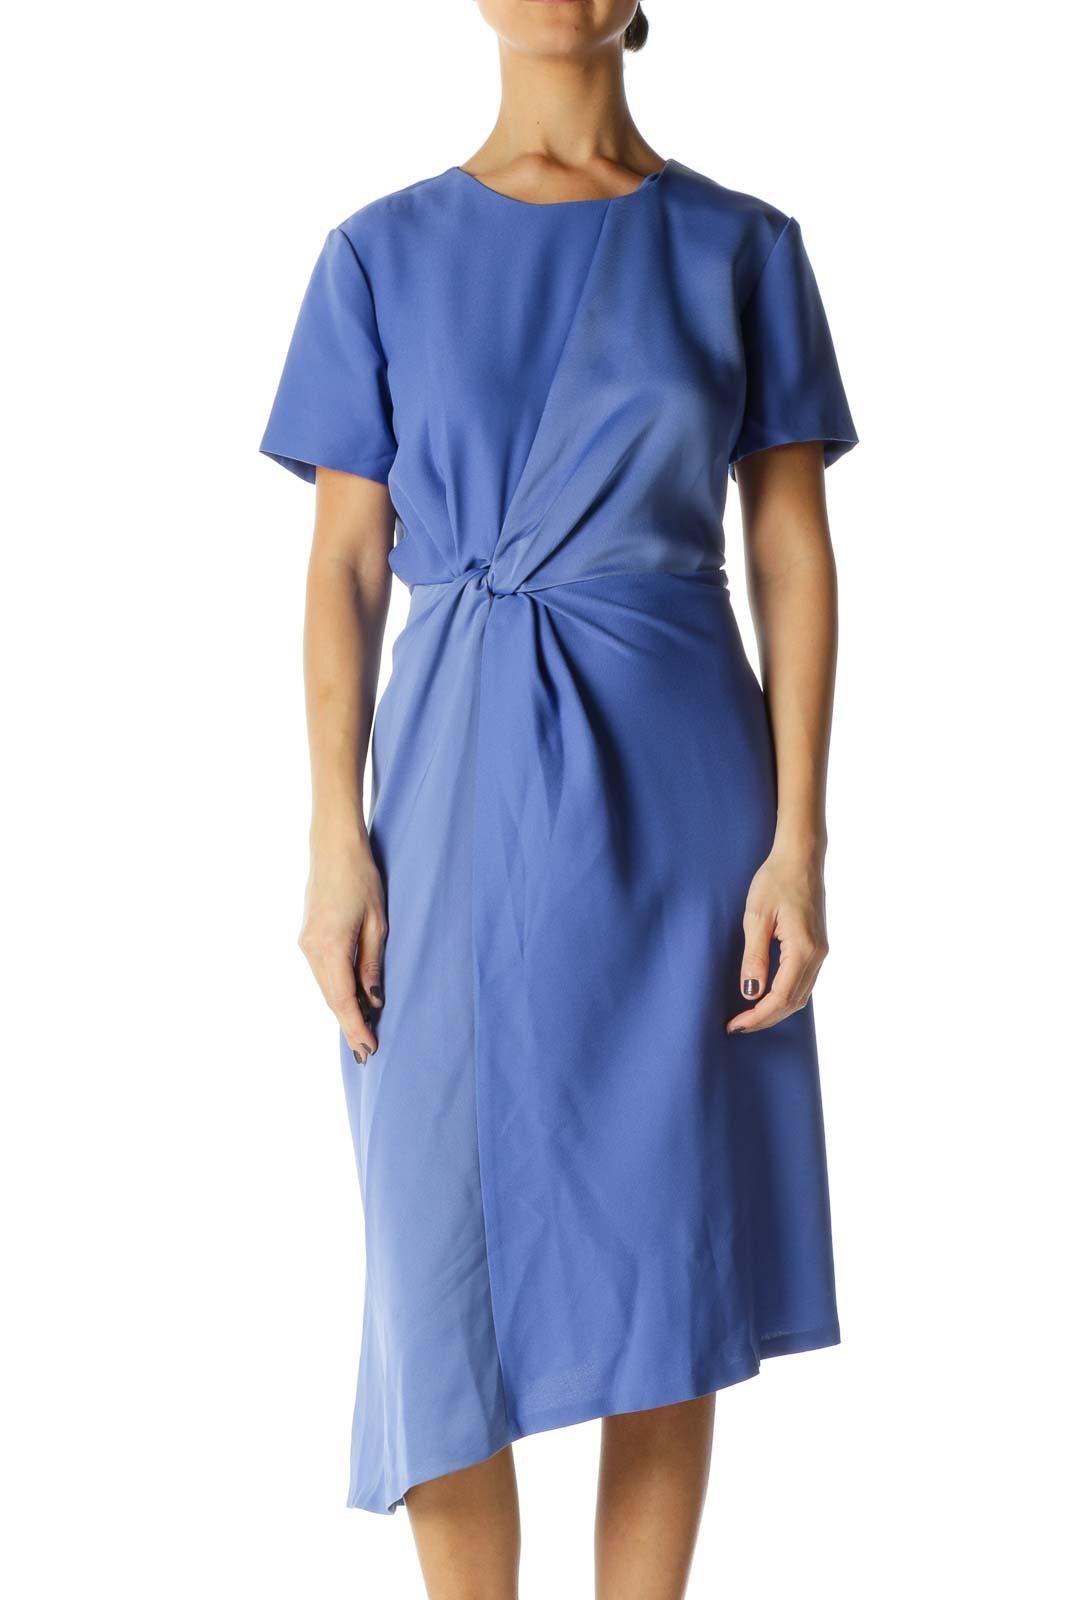 Blue Solid Crewneck A-Line Dresse